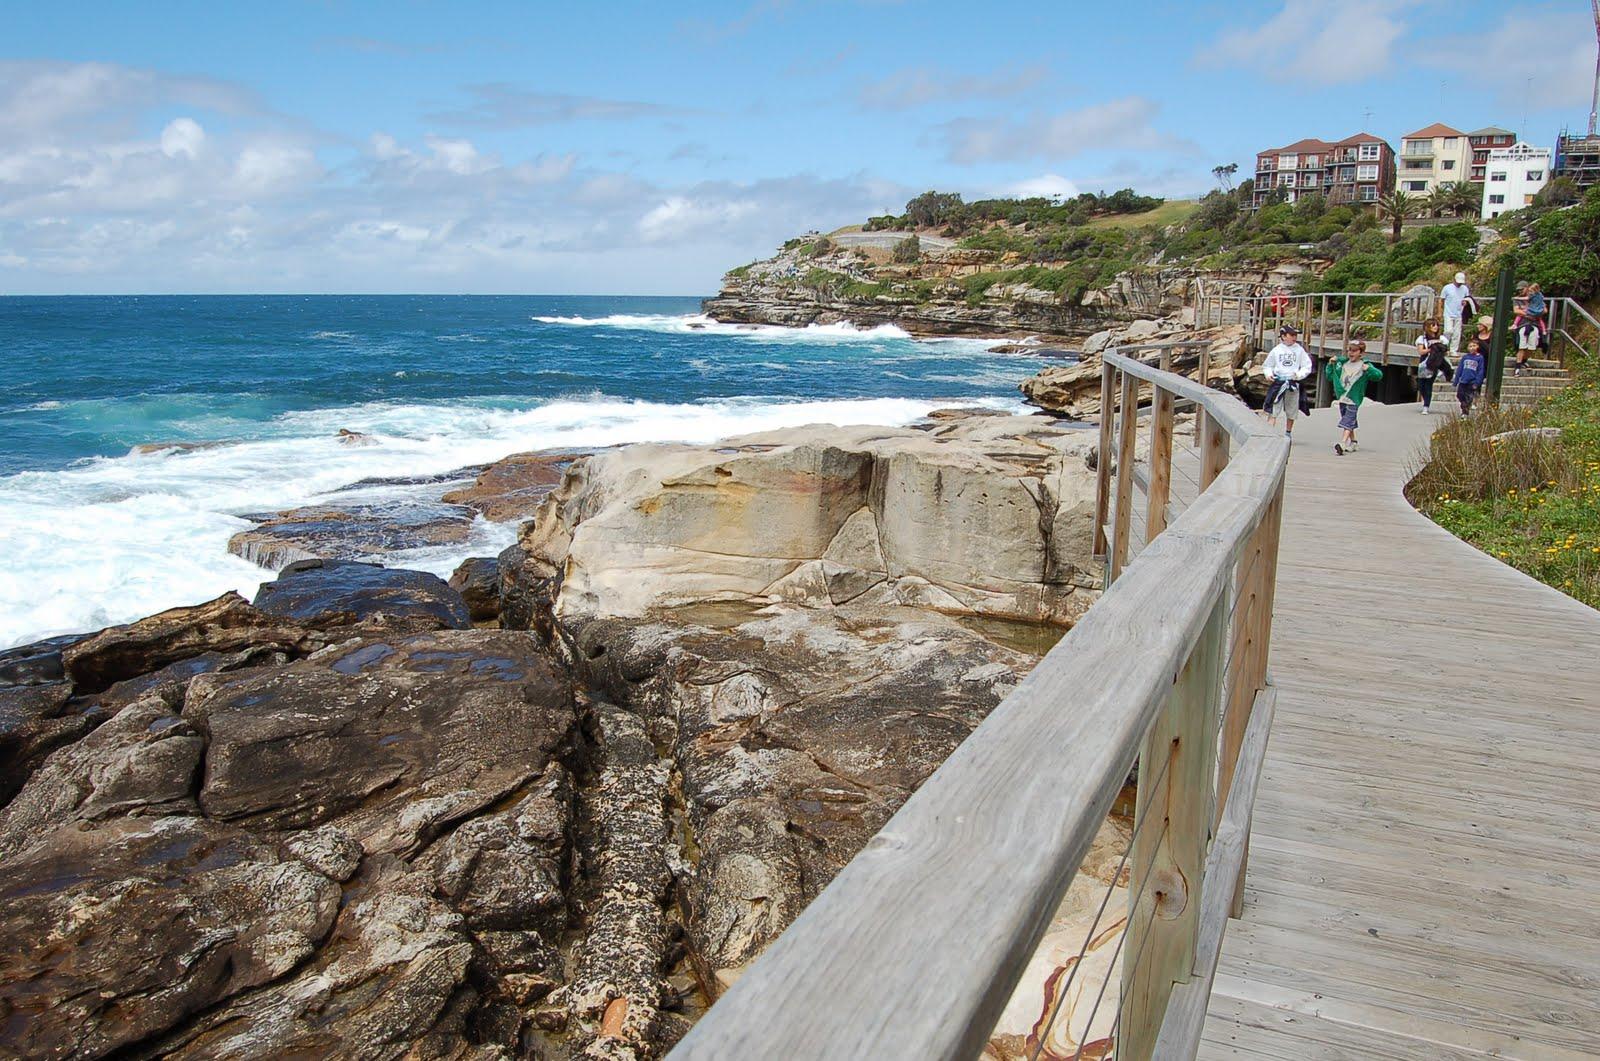 Bondi to bronte walk boardwalk